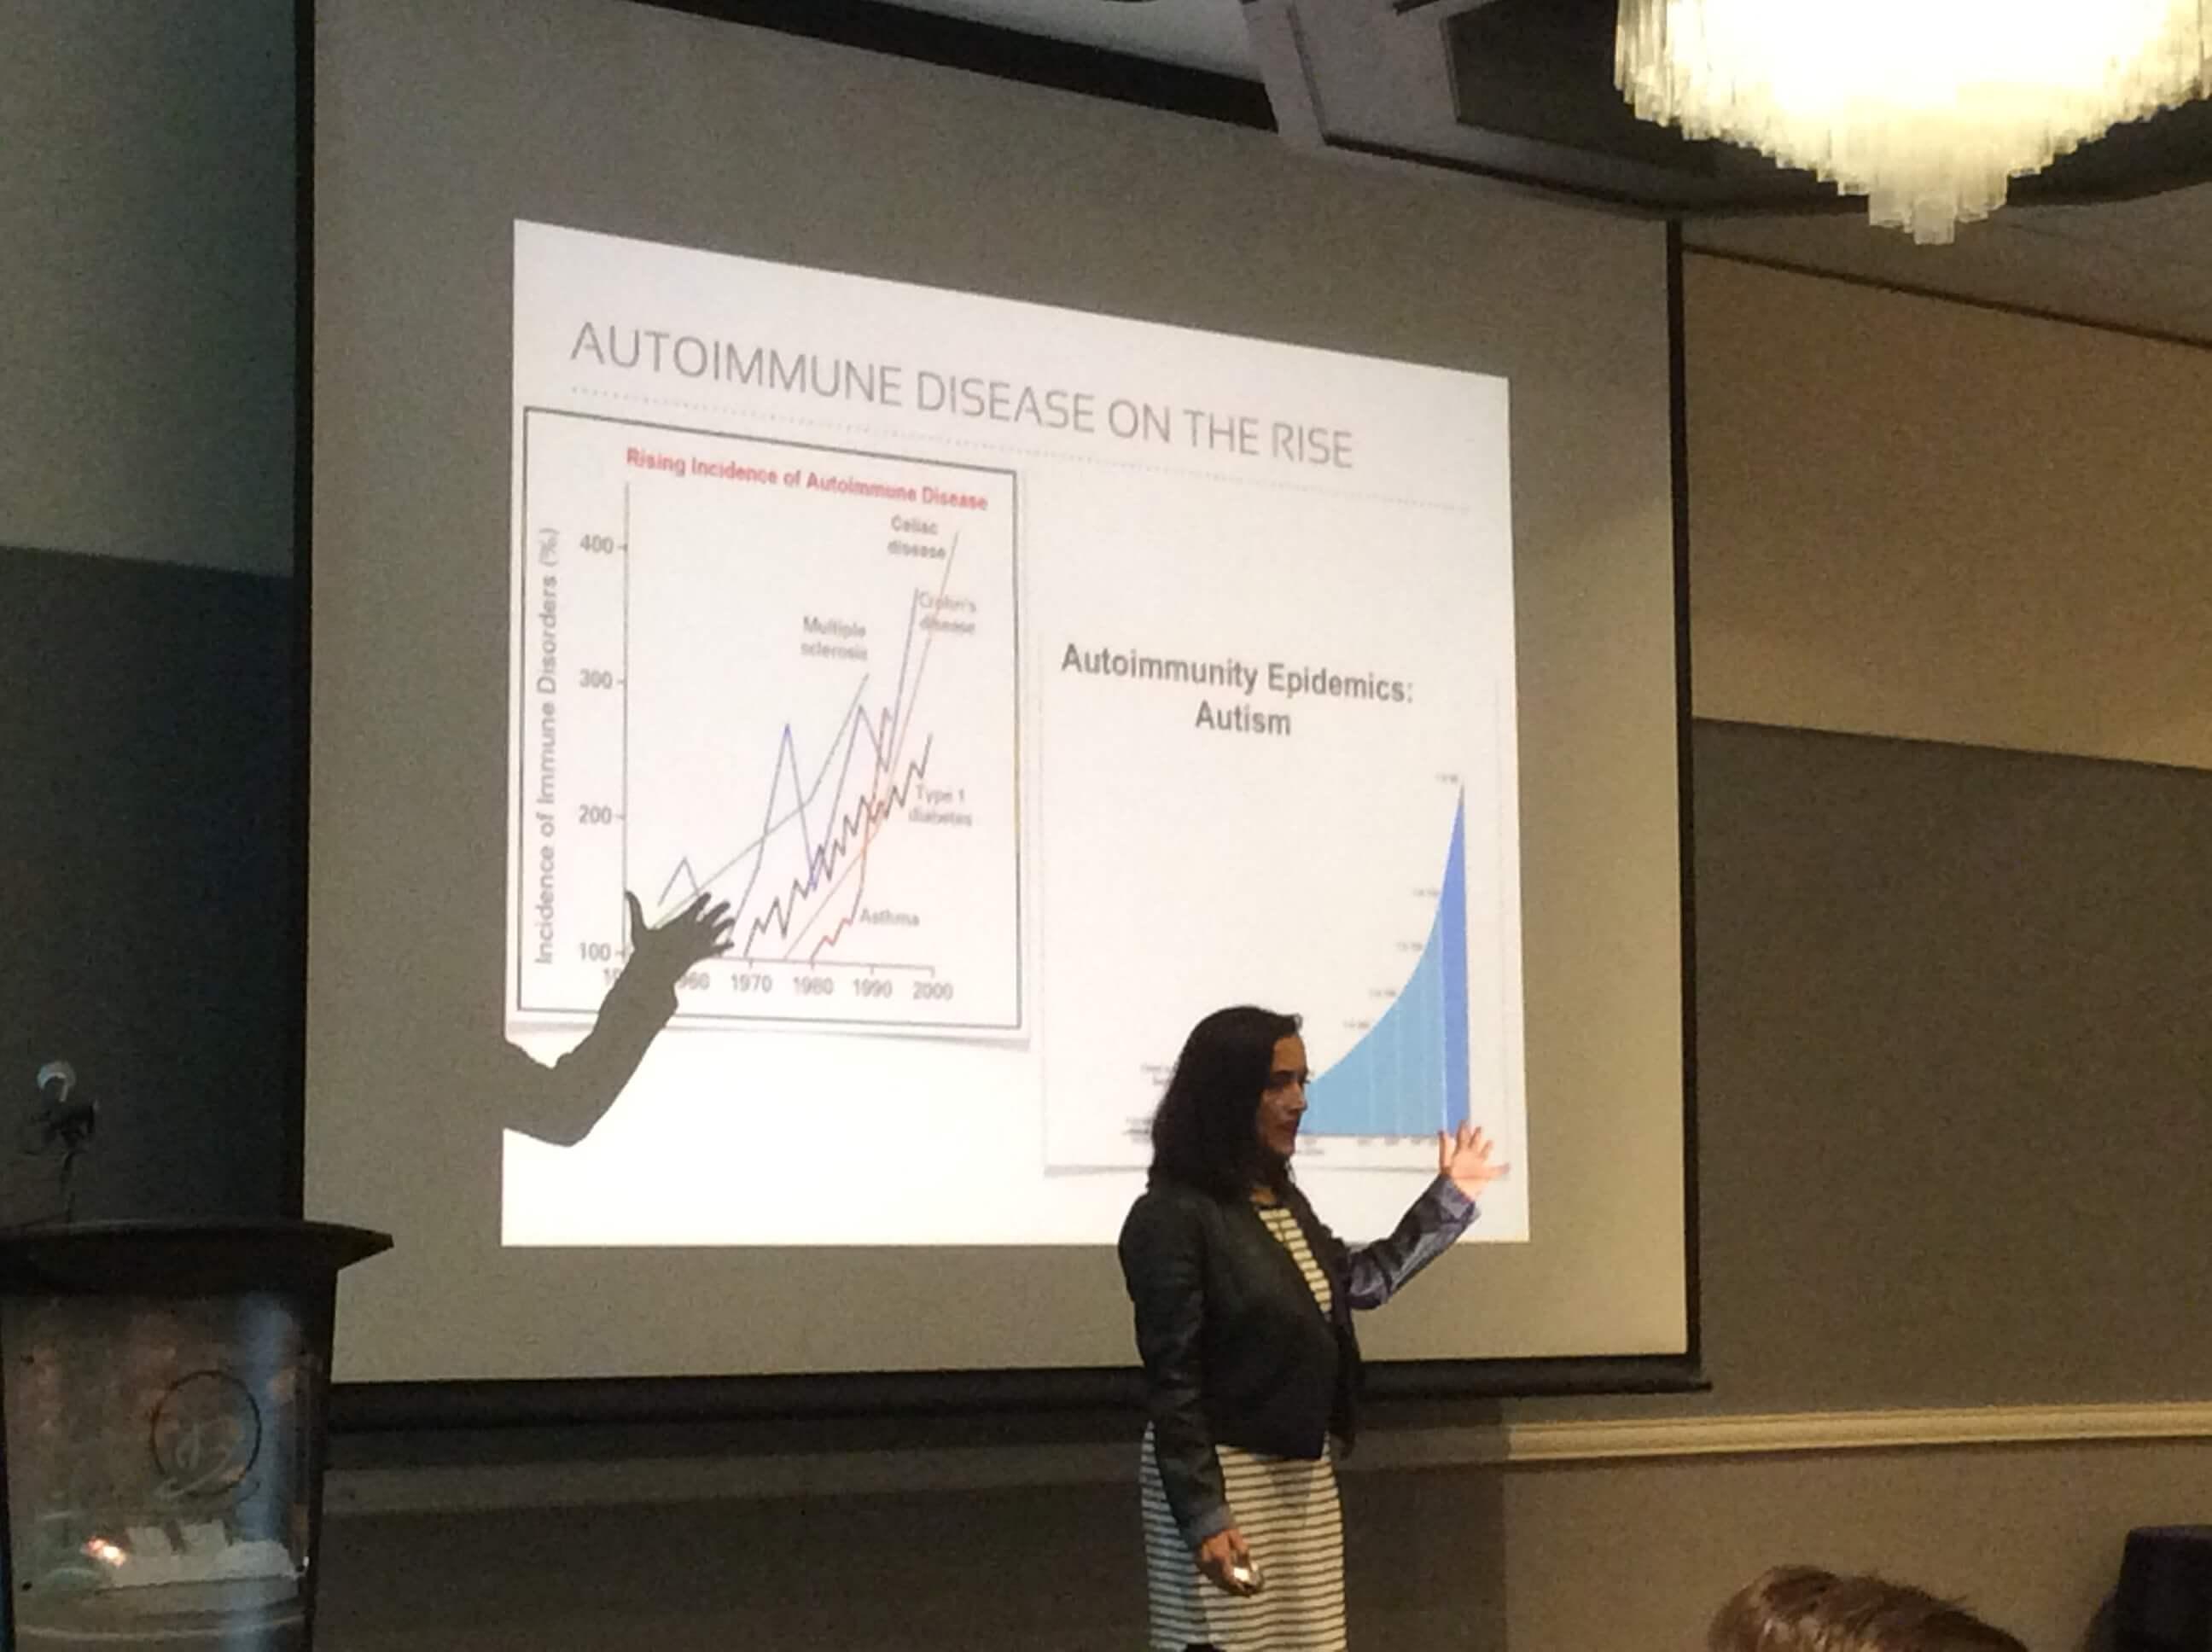 Autoimmune disease on the rise